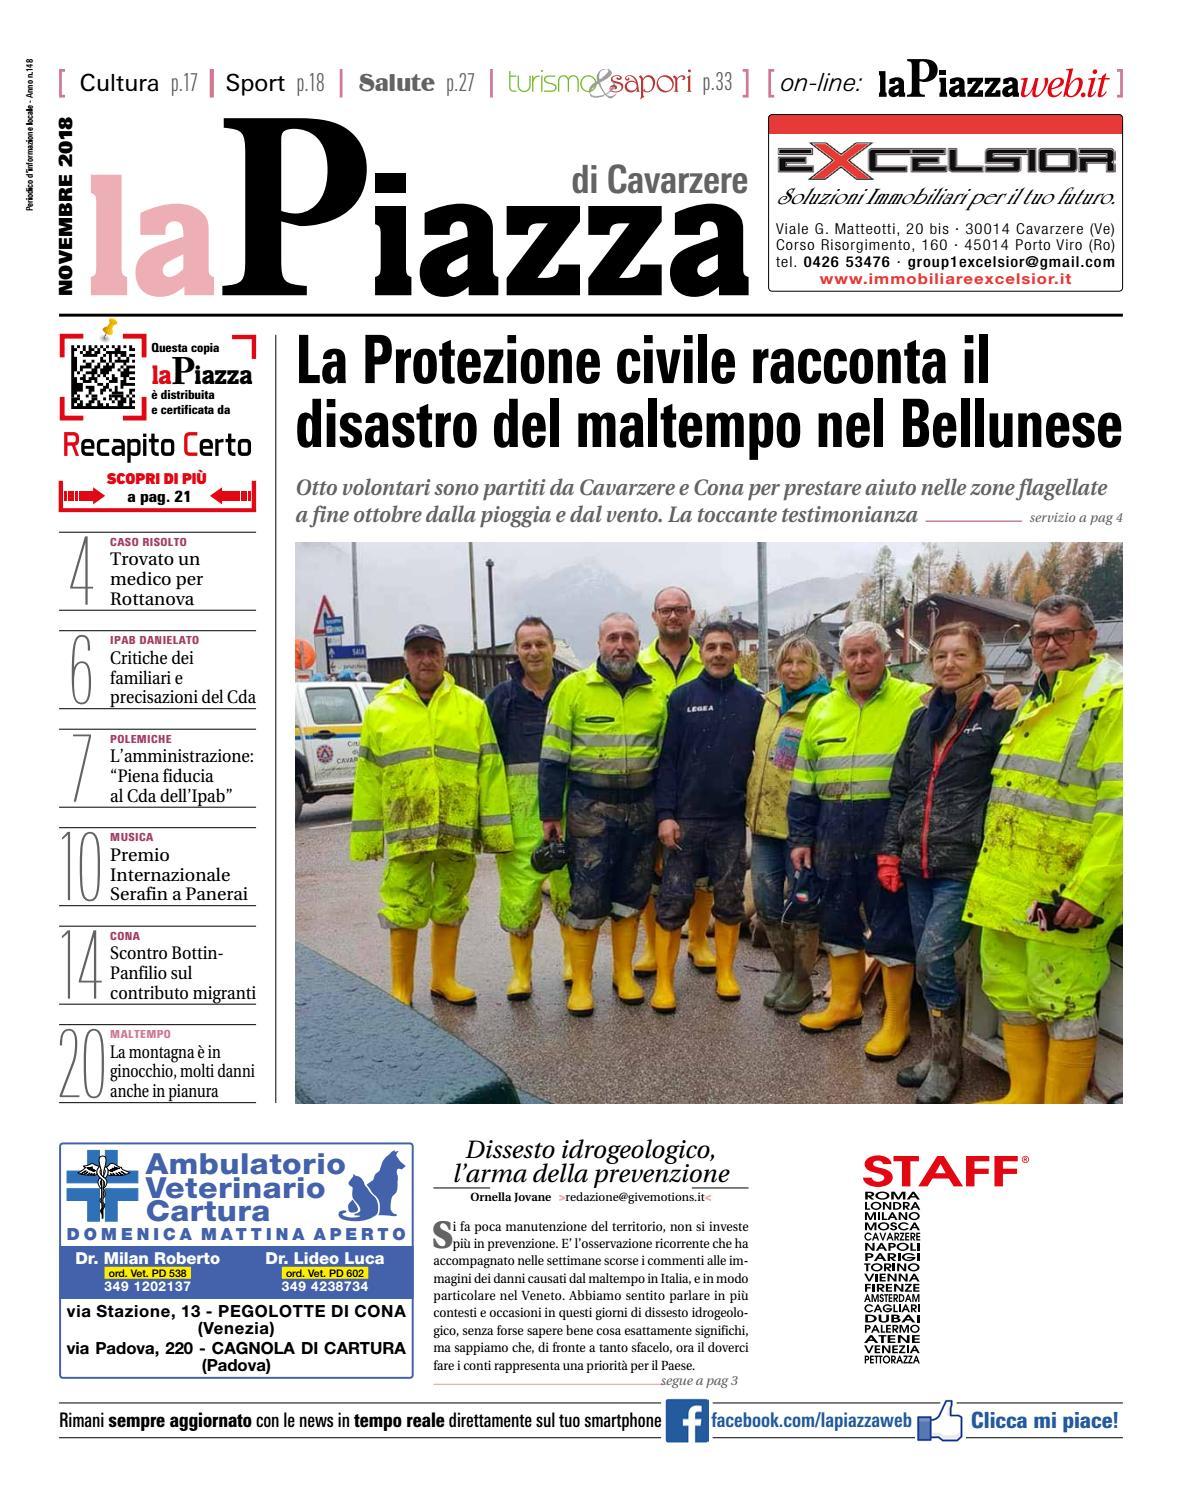 La Piazza di Cavarzere nov2018 n148 by lapiazza give emotions - issuu cbd461e70593